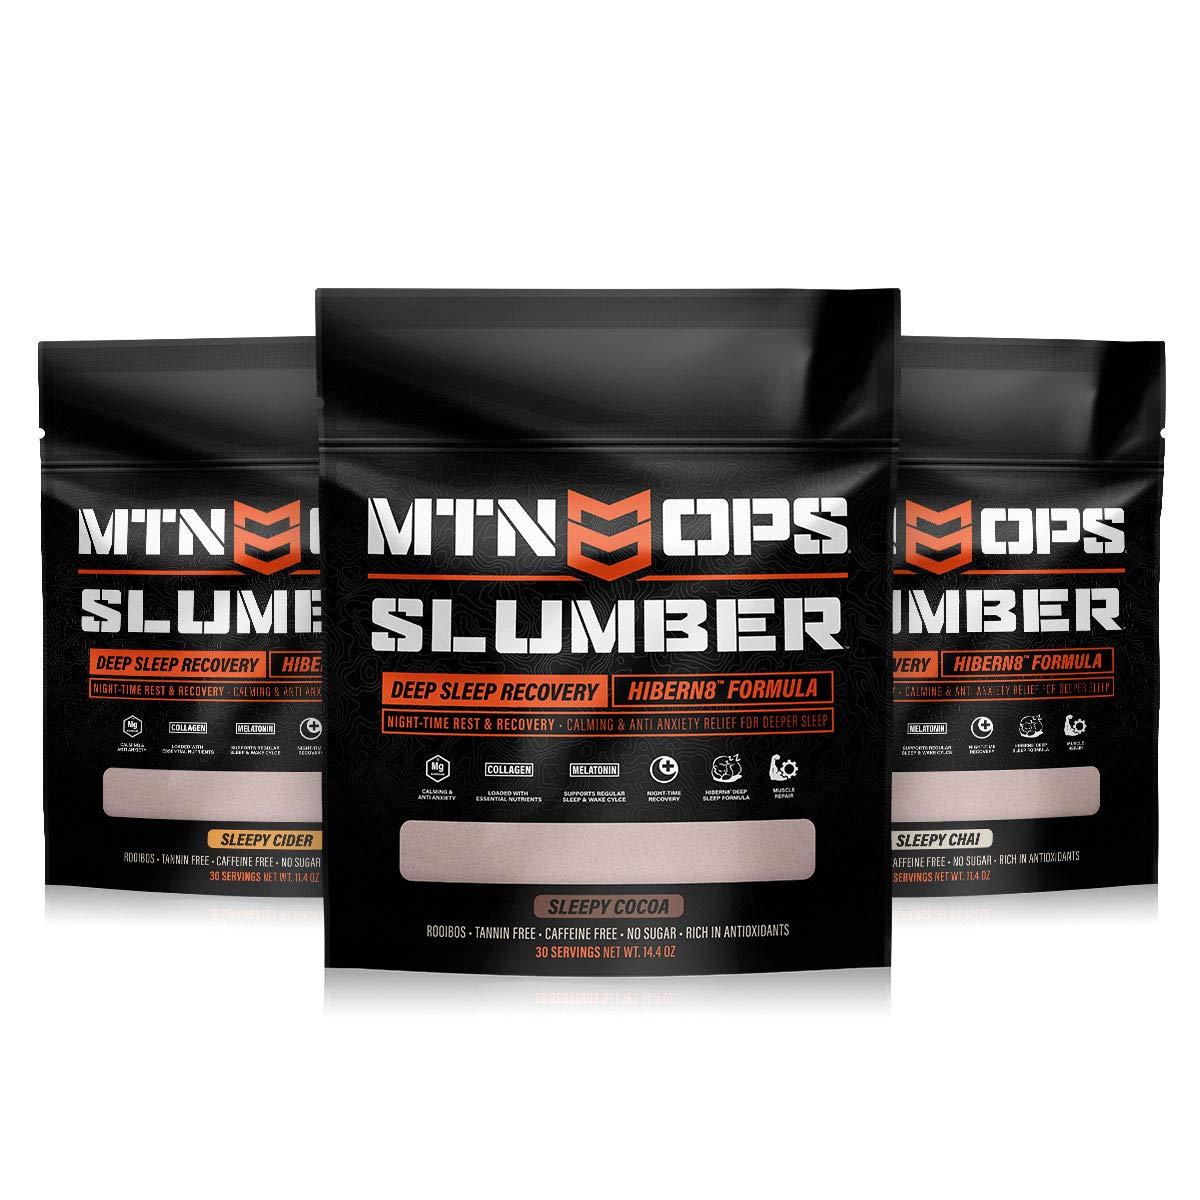 MTN OPS Slumber Hibern8 NighTime Rest Recovery Drink Sleep Aid (3 Pack), Sleepy Chai Flavor, Sleepy Cocoa, Sleepy Cider, 30 Servings Per Container